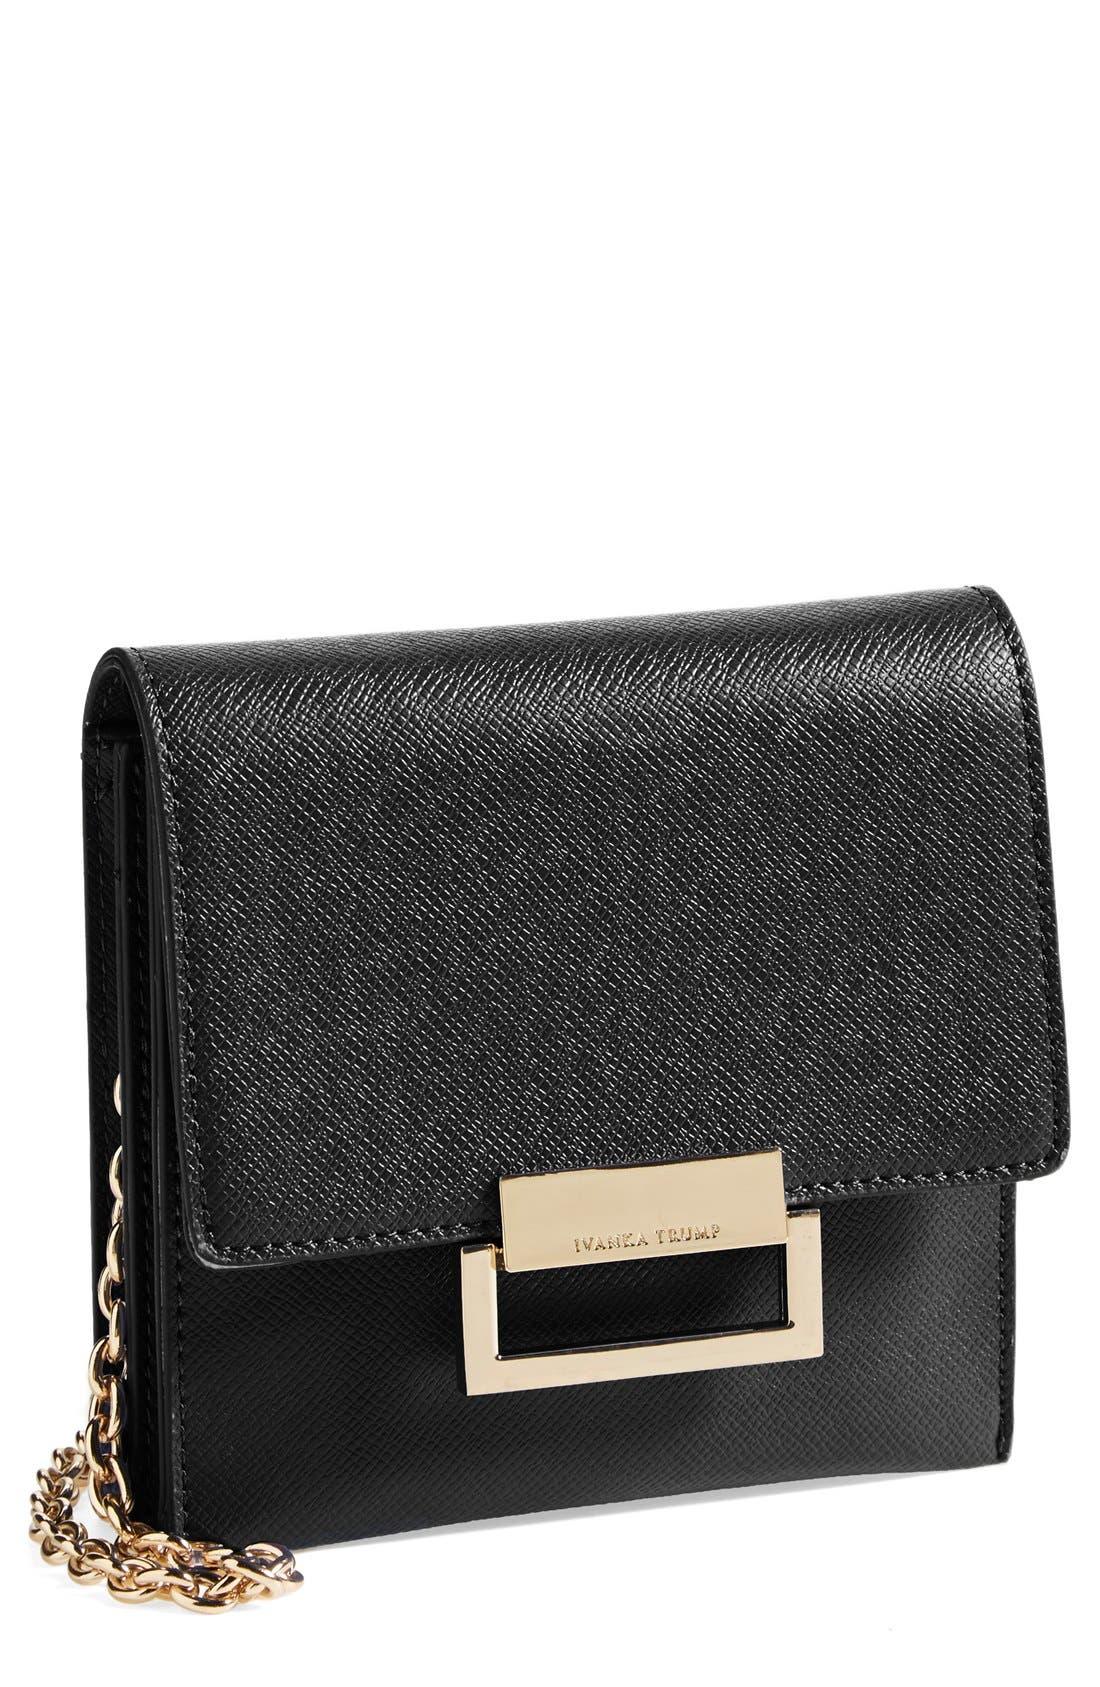 Alternate Image 1 Selected - Ivanka Trump 'Mini Sophia' Crossbody Bag